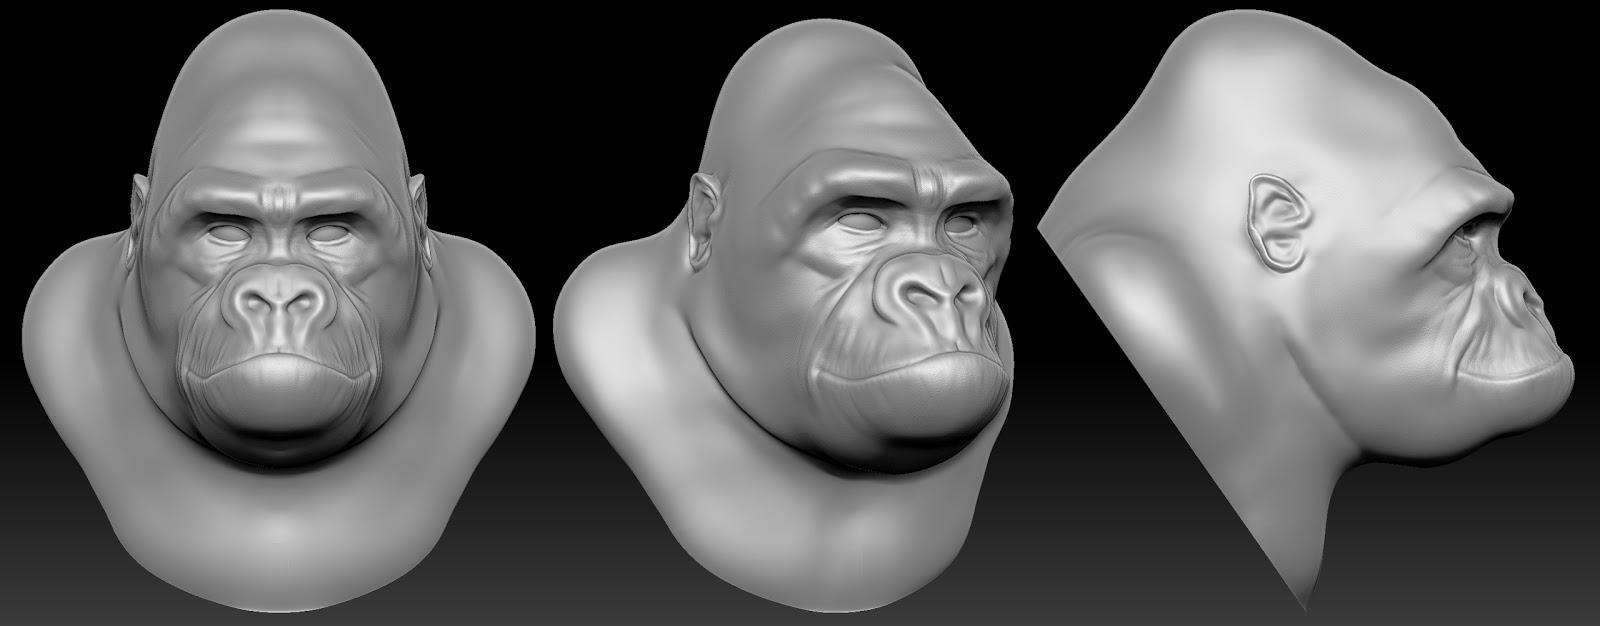 The Blog of Hayden McGowan: Gorilla Head Speed Sculpt